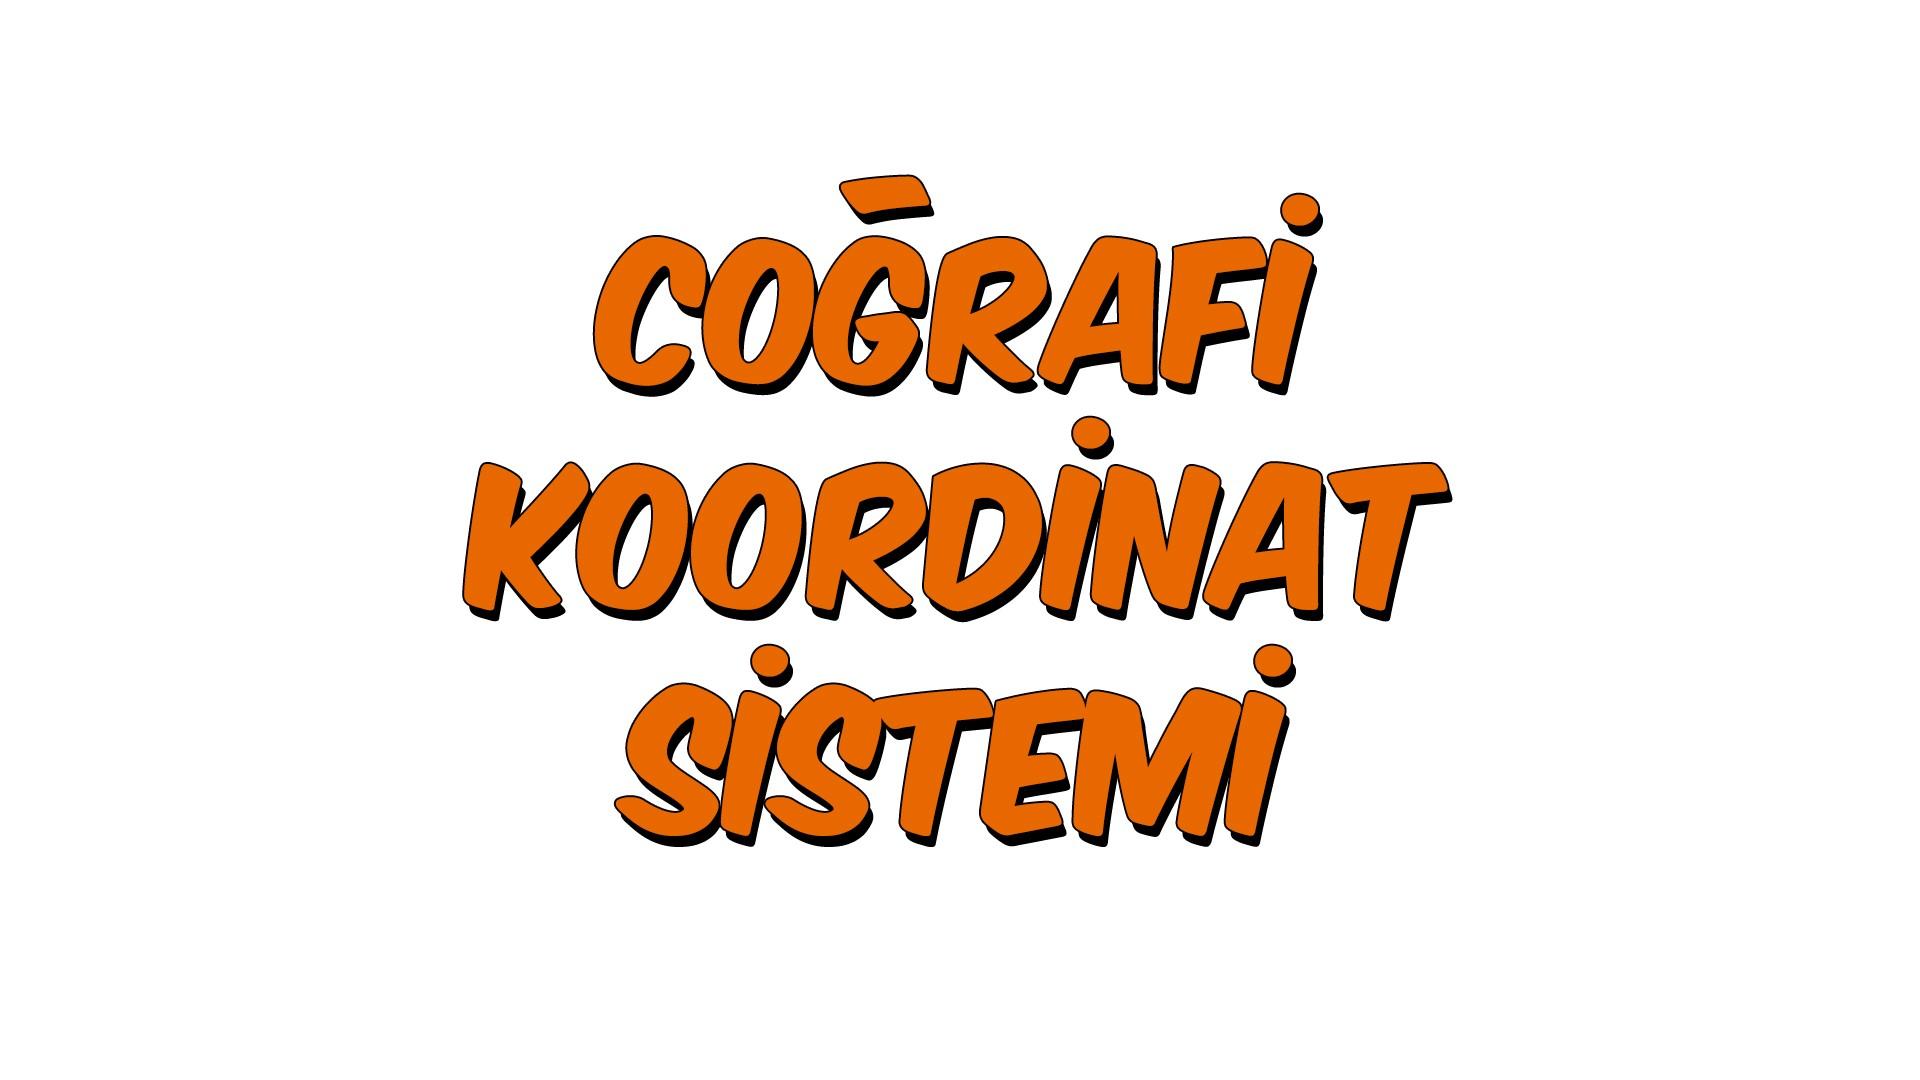 Coğrafi Koordinat Sistemi